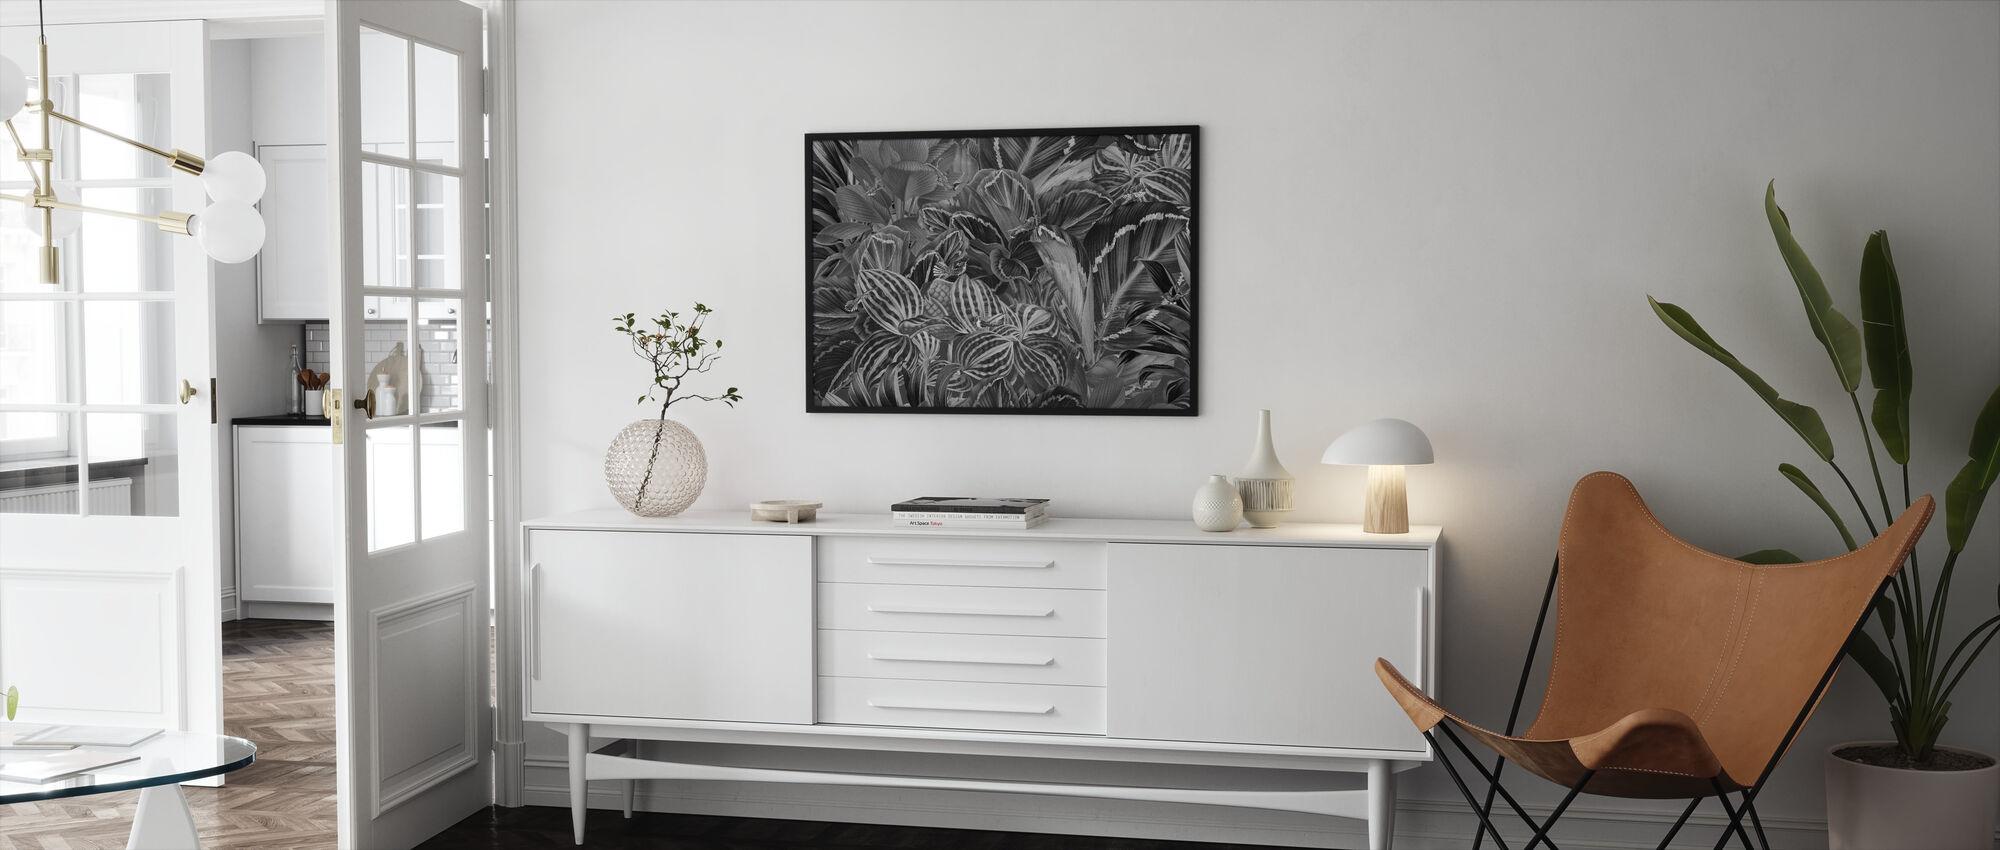 Paradijsvogels - Ingelijste print - Woonkamer